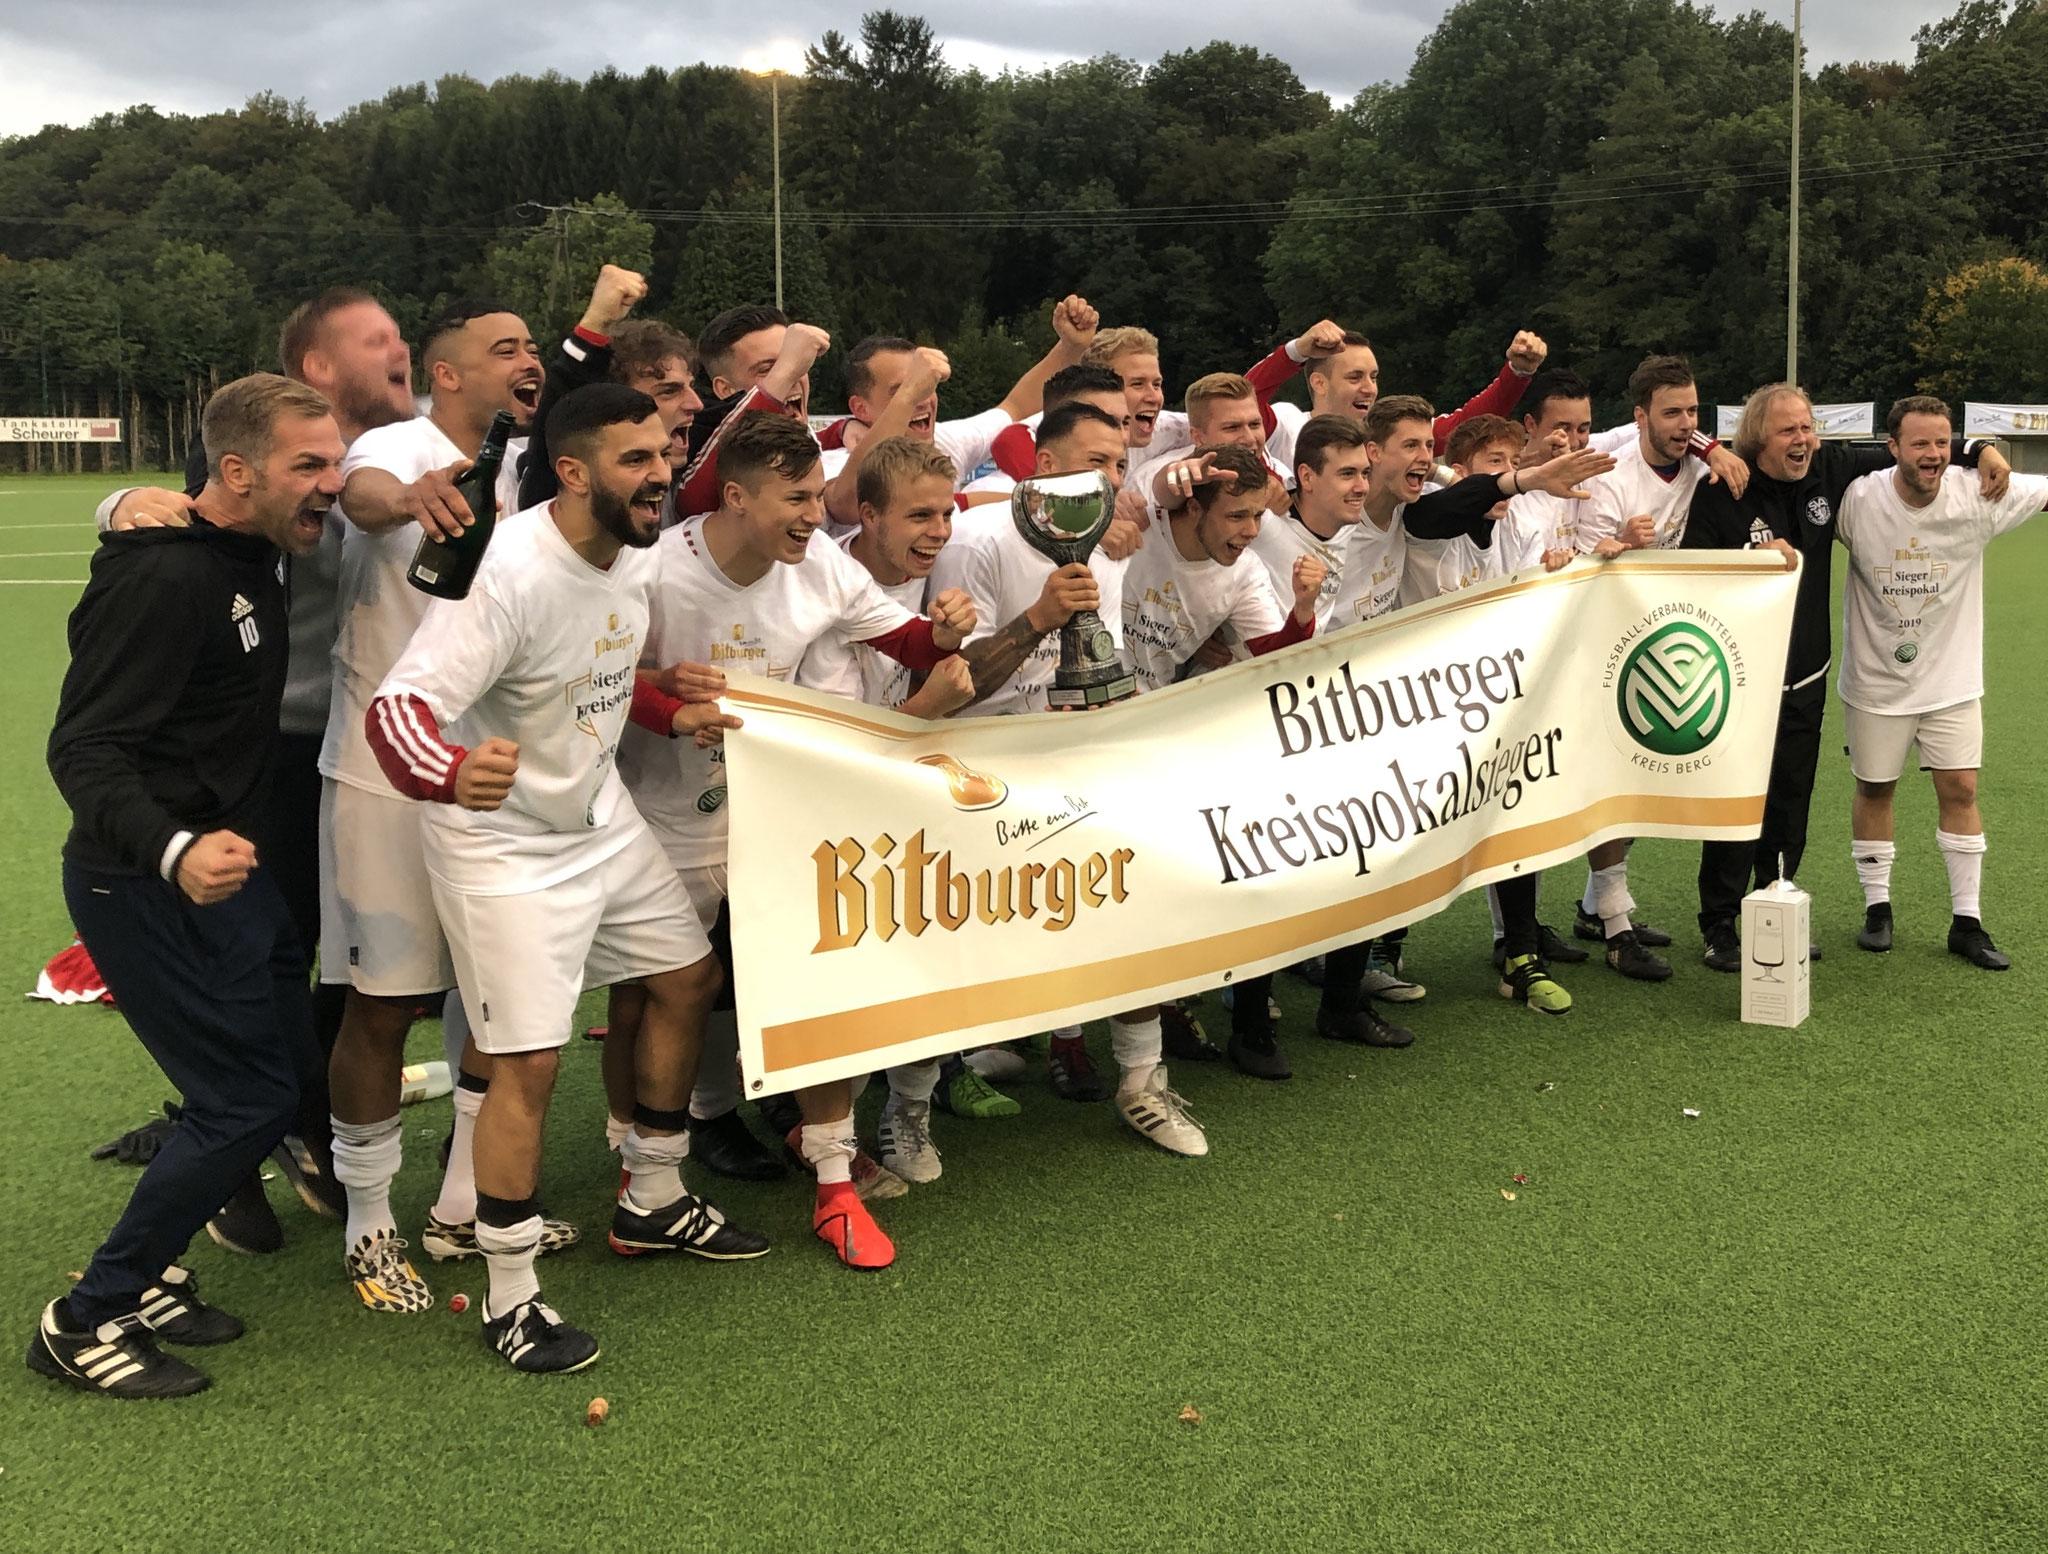 Kreispokalsieger 2019 !